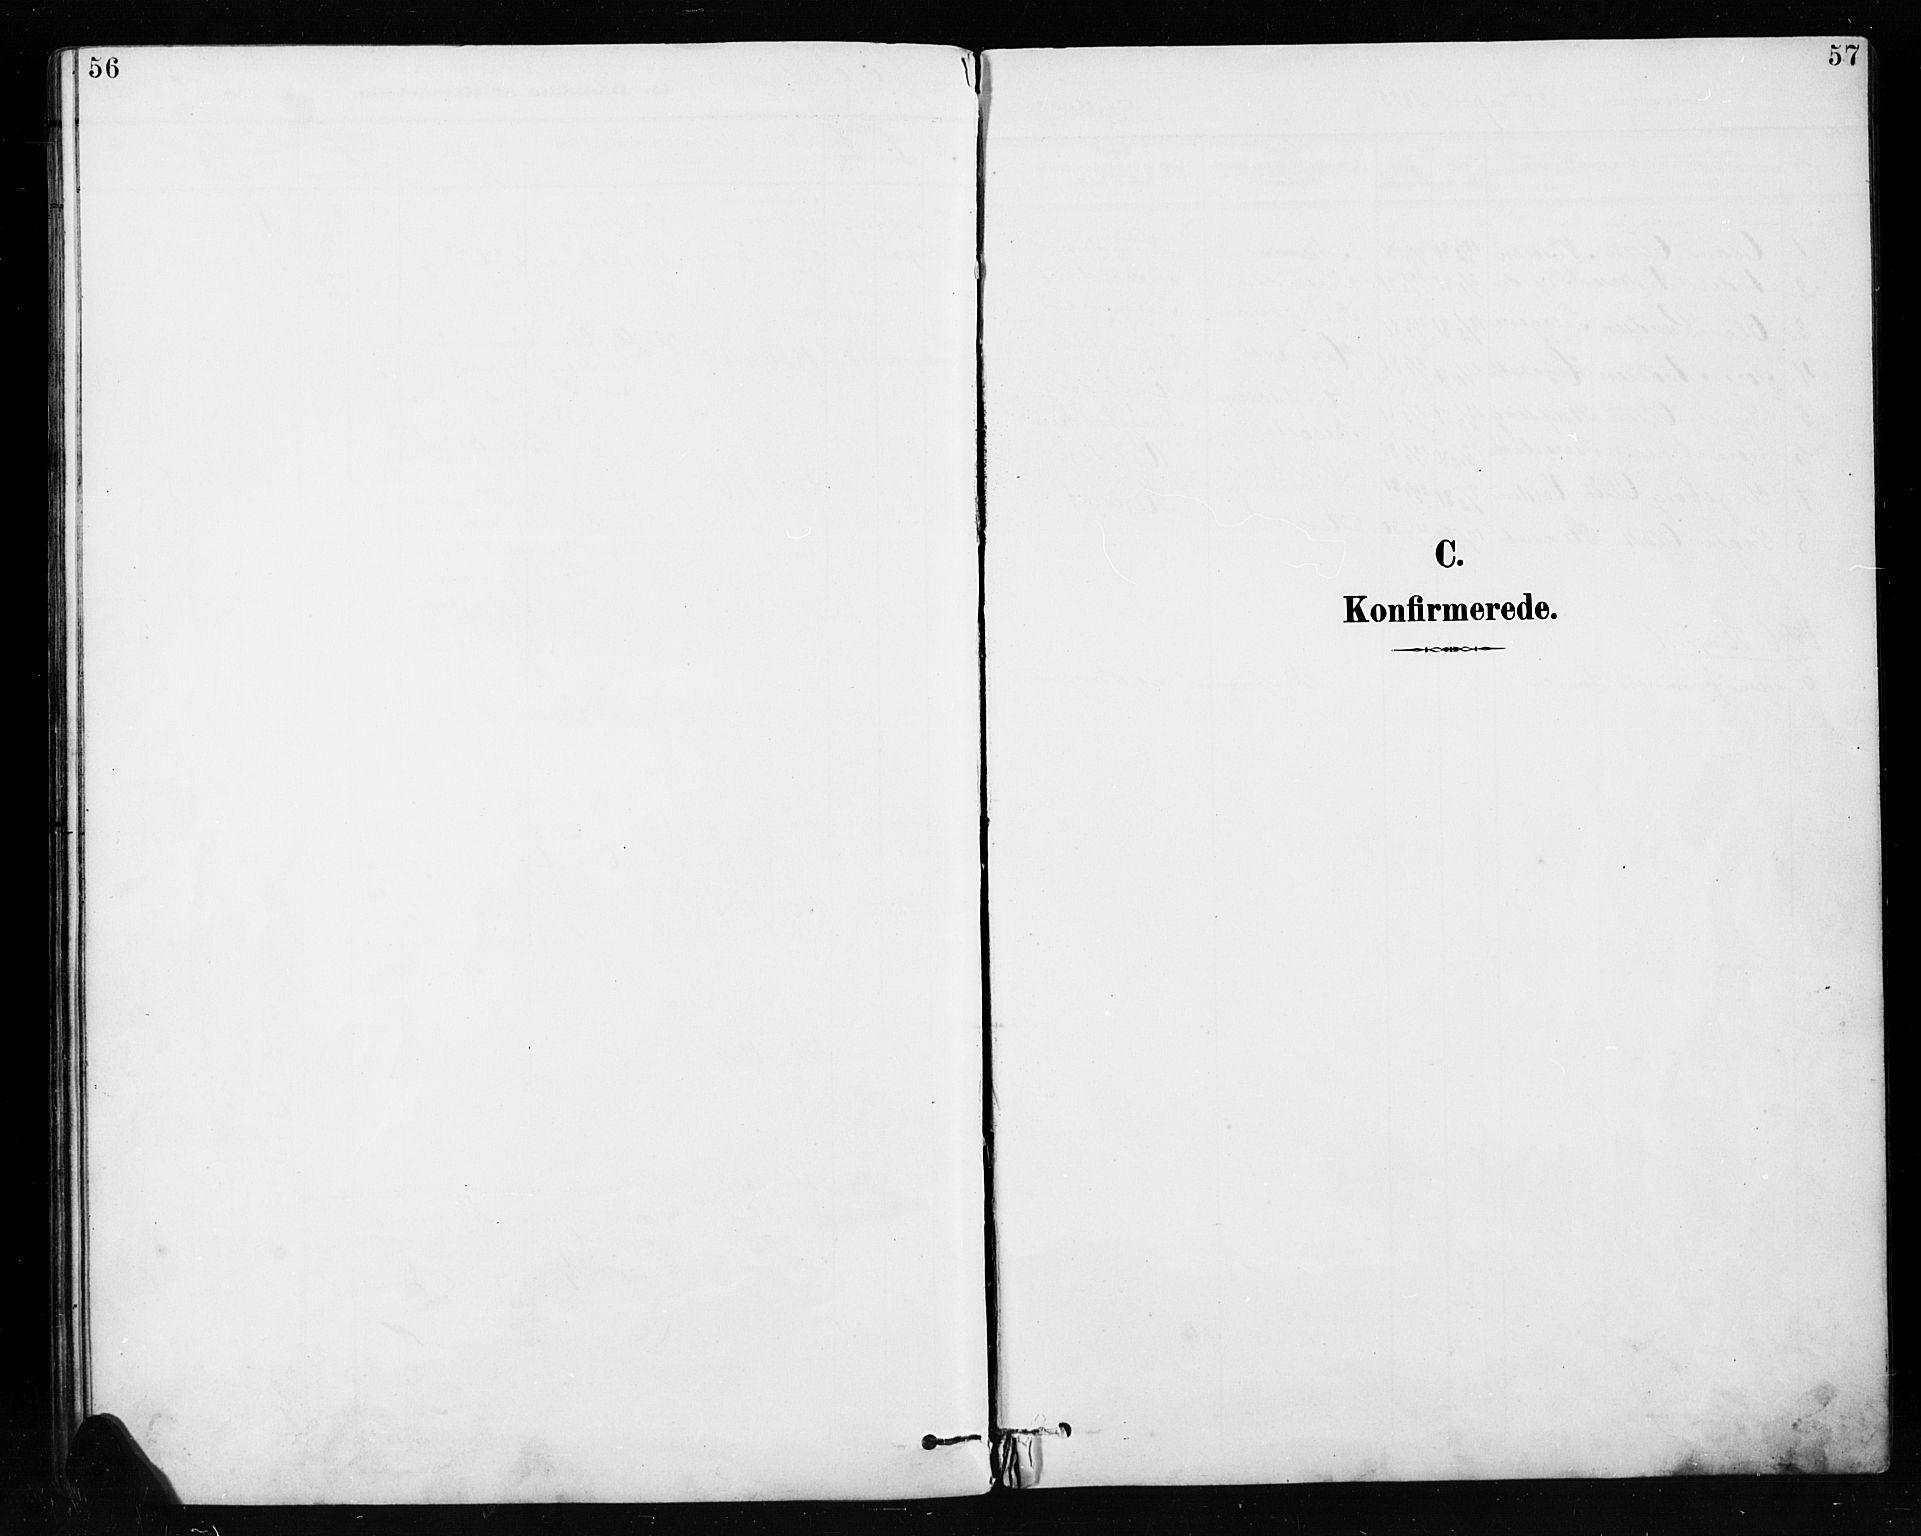 SAH, Etnedal prestekontor, H/Ha/Hab/Habb/L0001: Klokkerbok nr. II 1, 1894-1911, s. 56-57